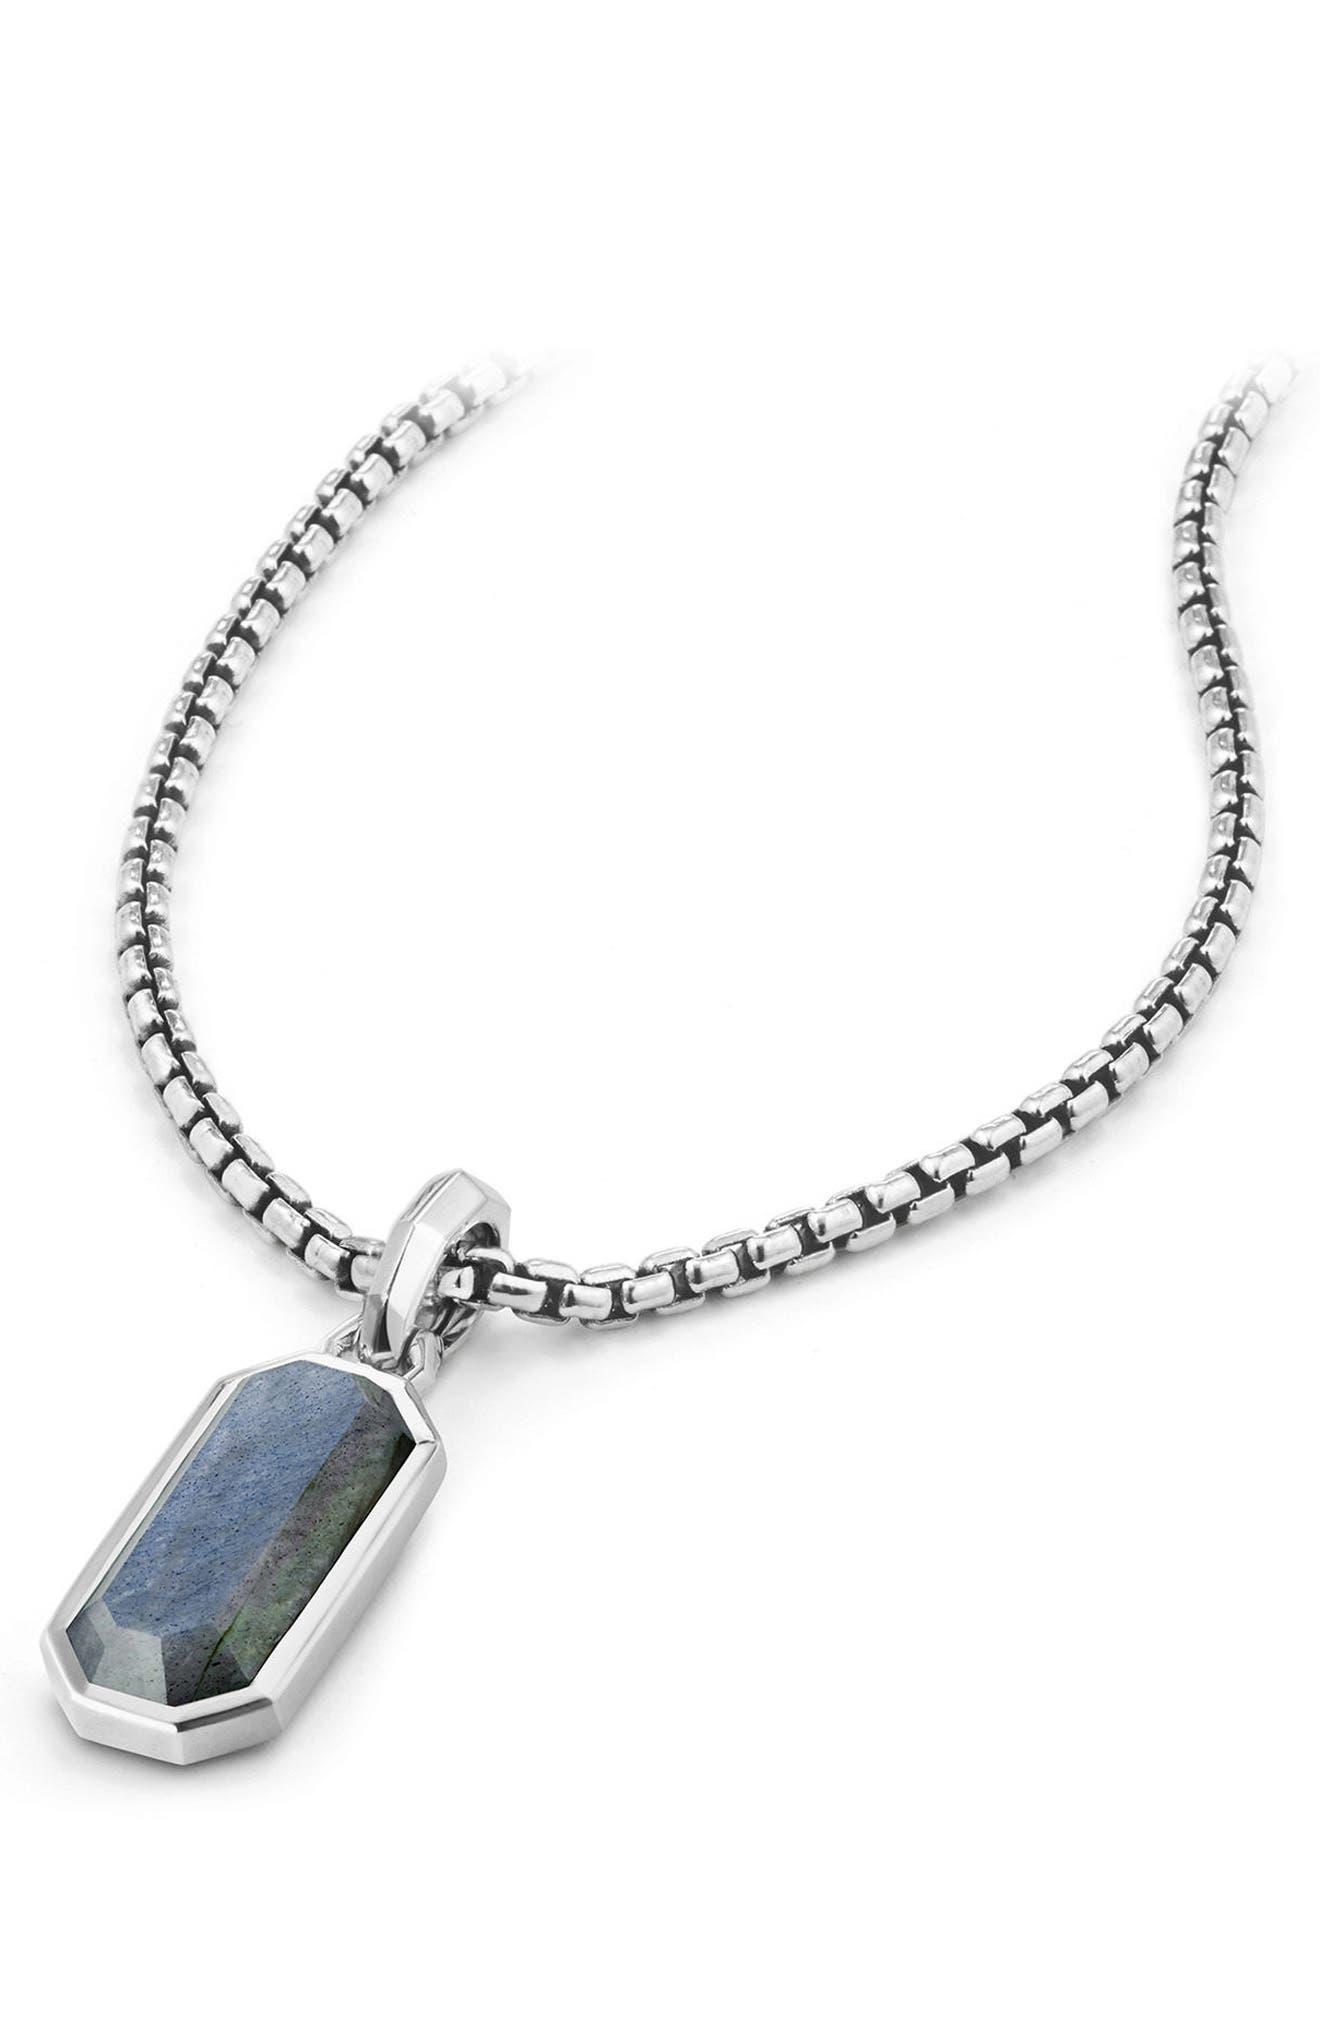 Emerald Cut Semiprecious Stone Amulet,                             Alternate thumbnail 3, color,                             LABRADORITE